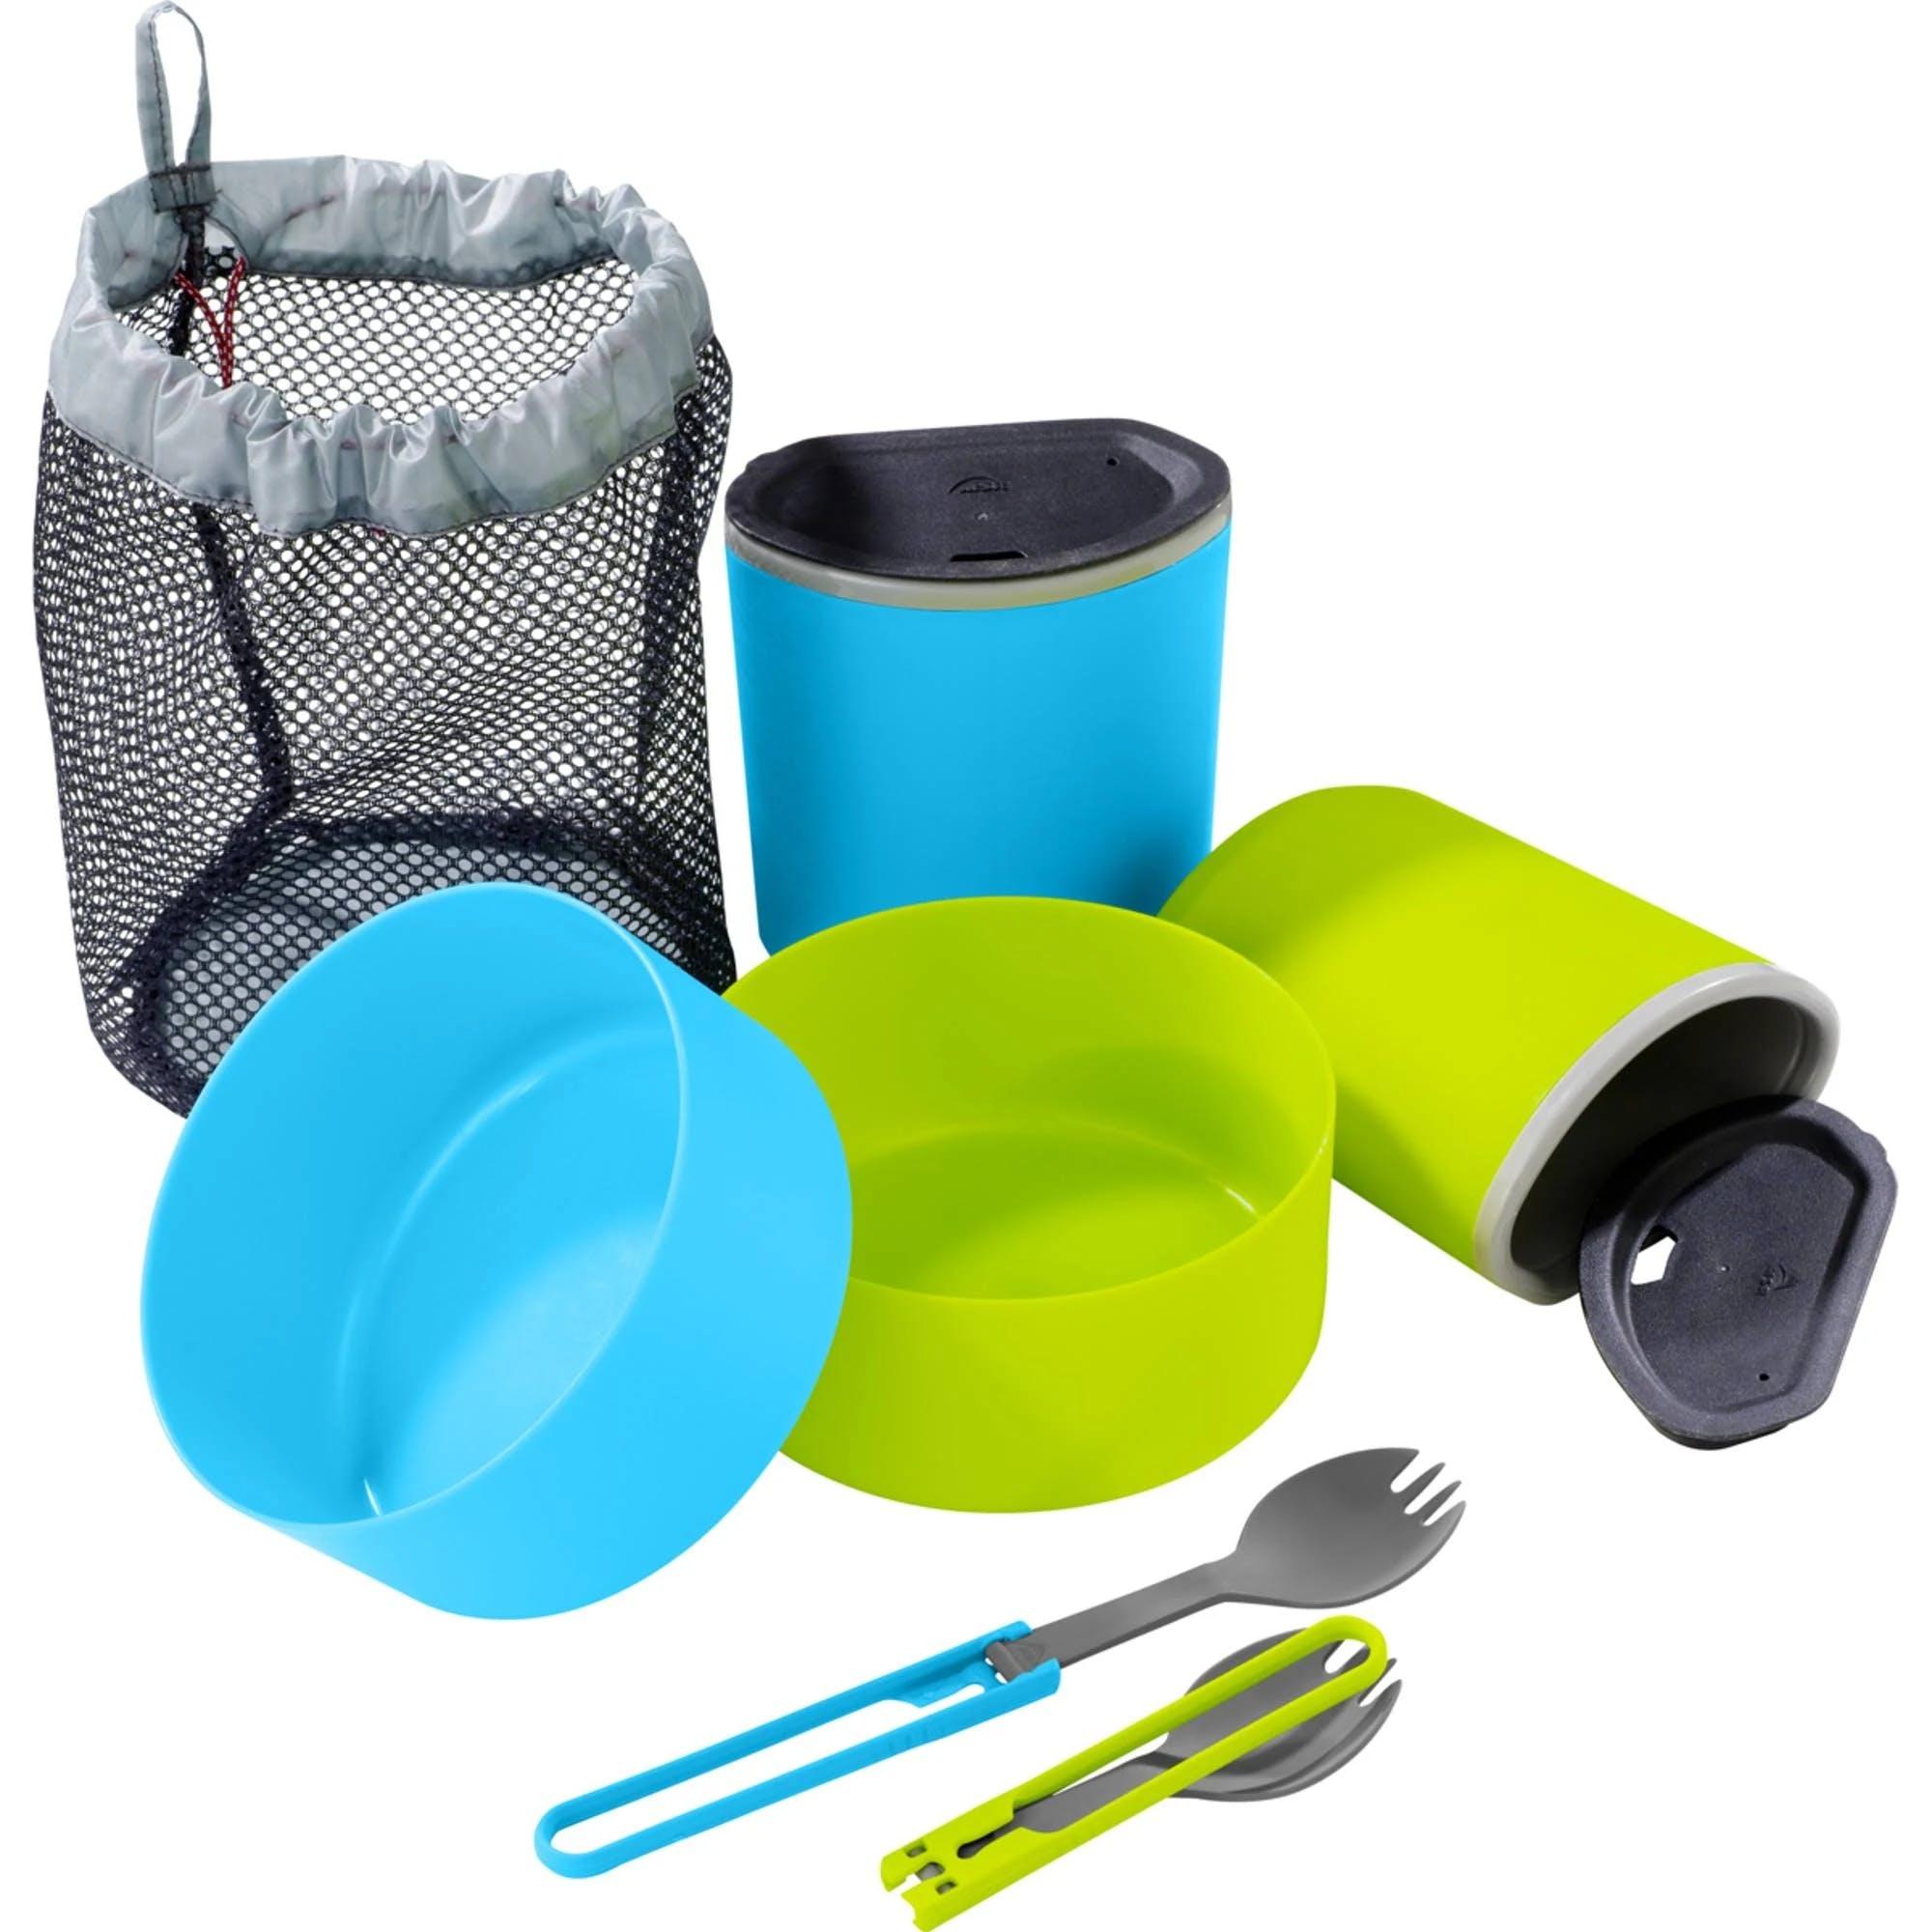 MSR 2 Person Mess Kit